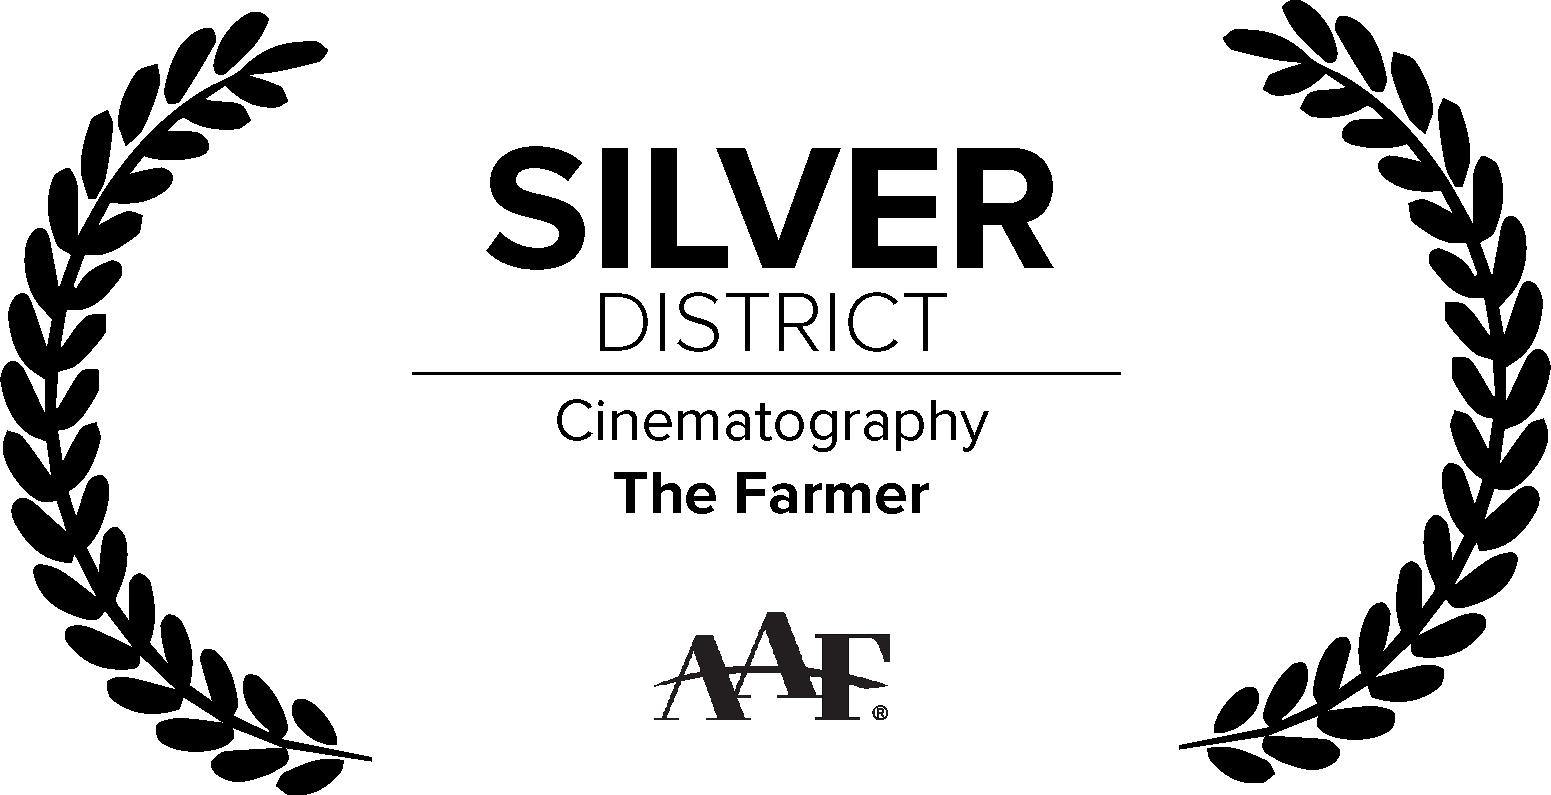 AAF_Silver_Cine@3x.png